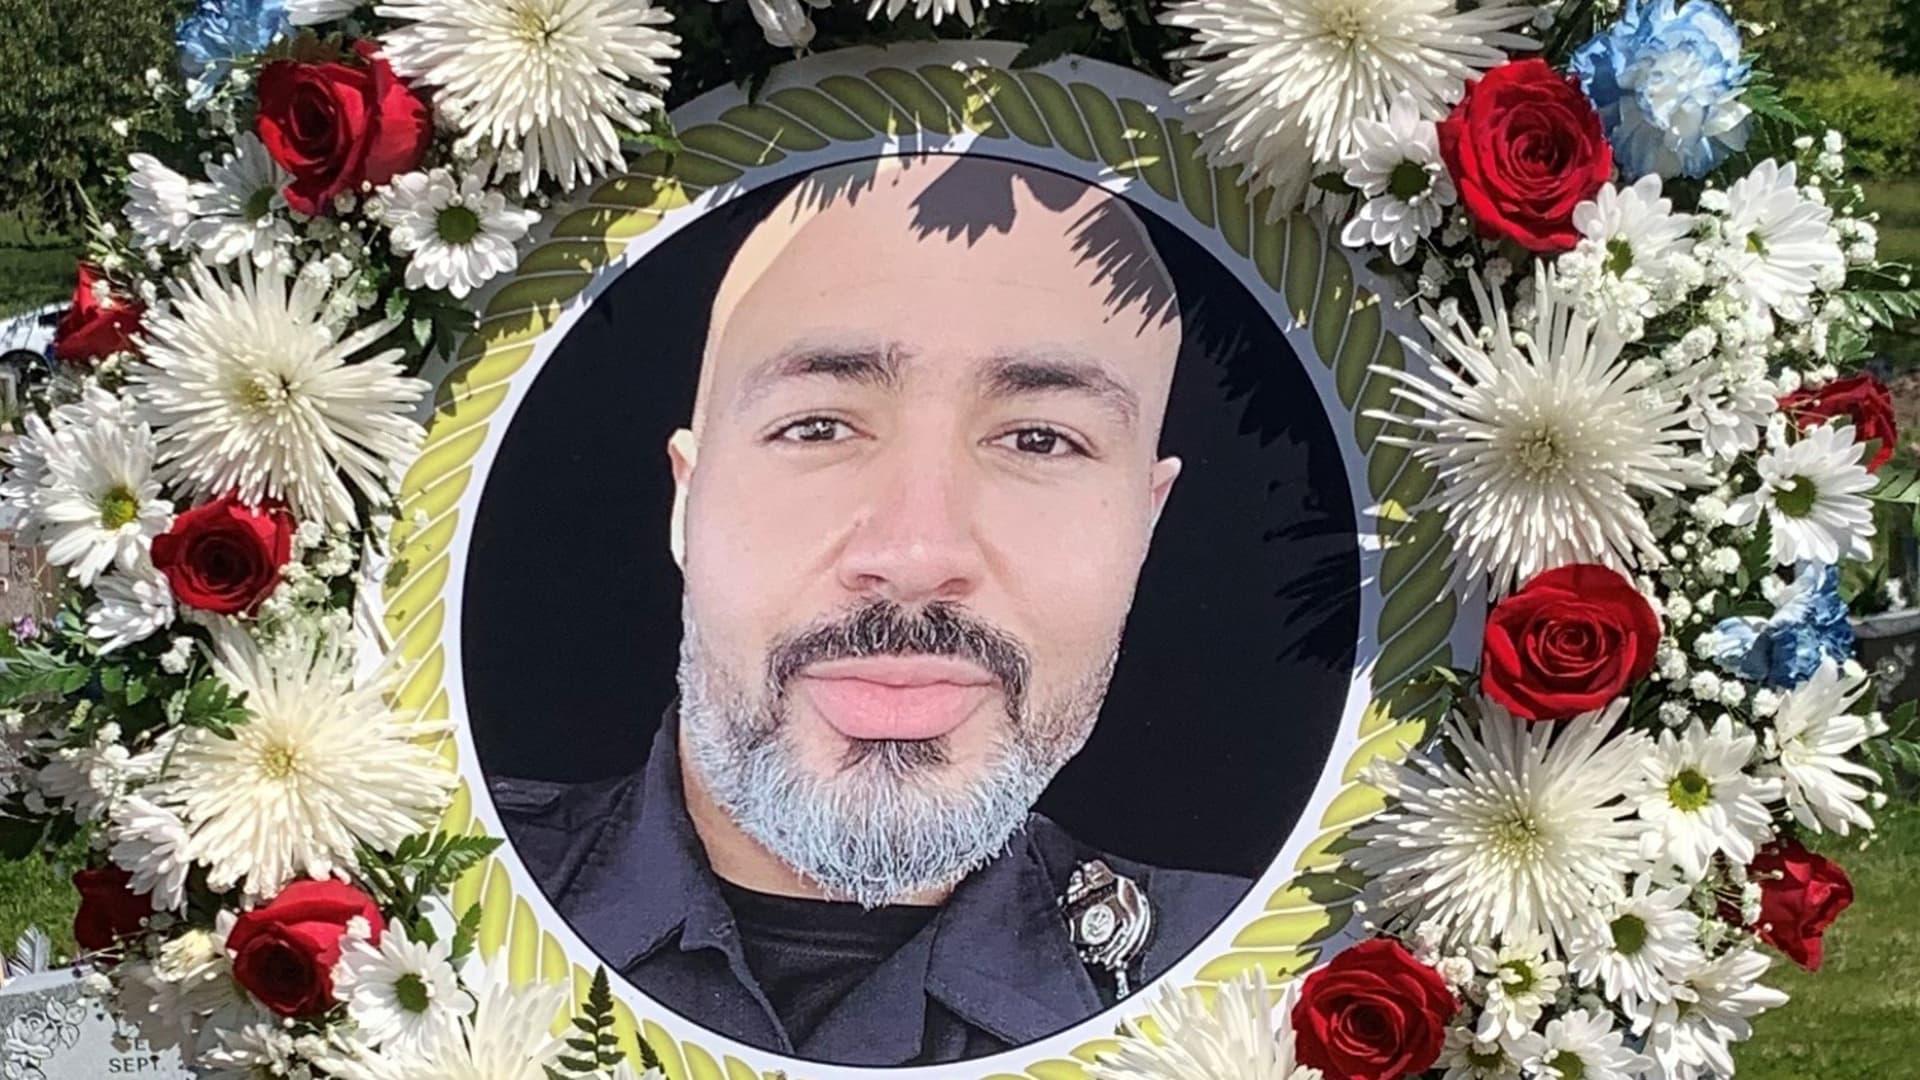 Wreath dedicated to Omar Palmer.